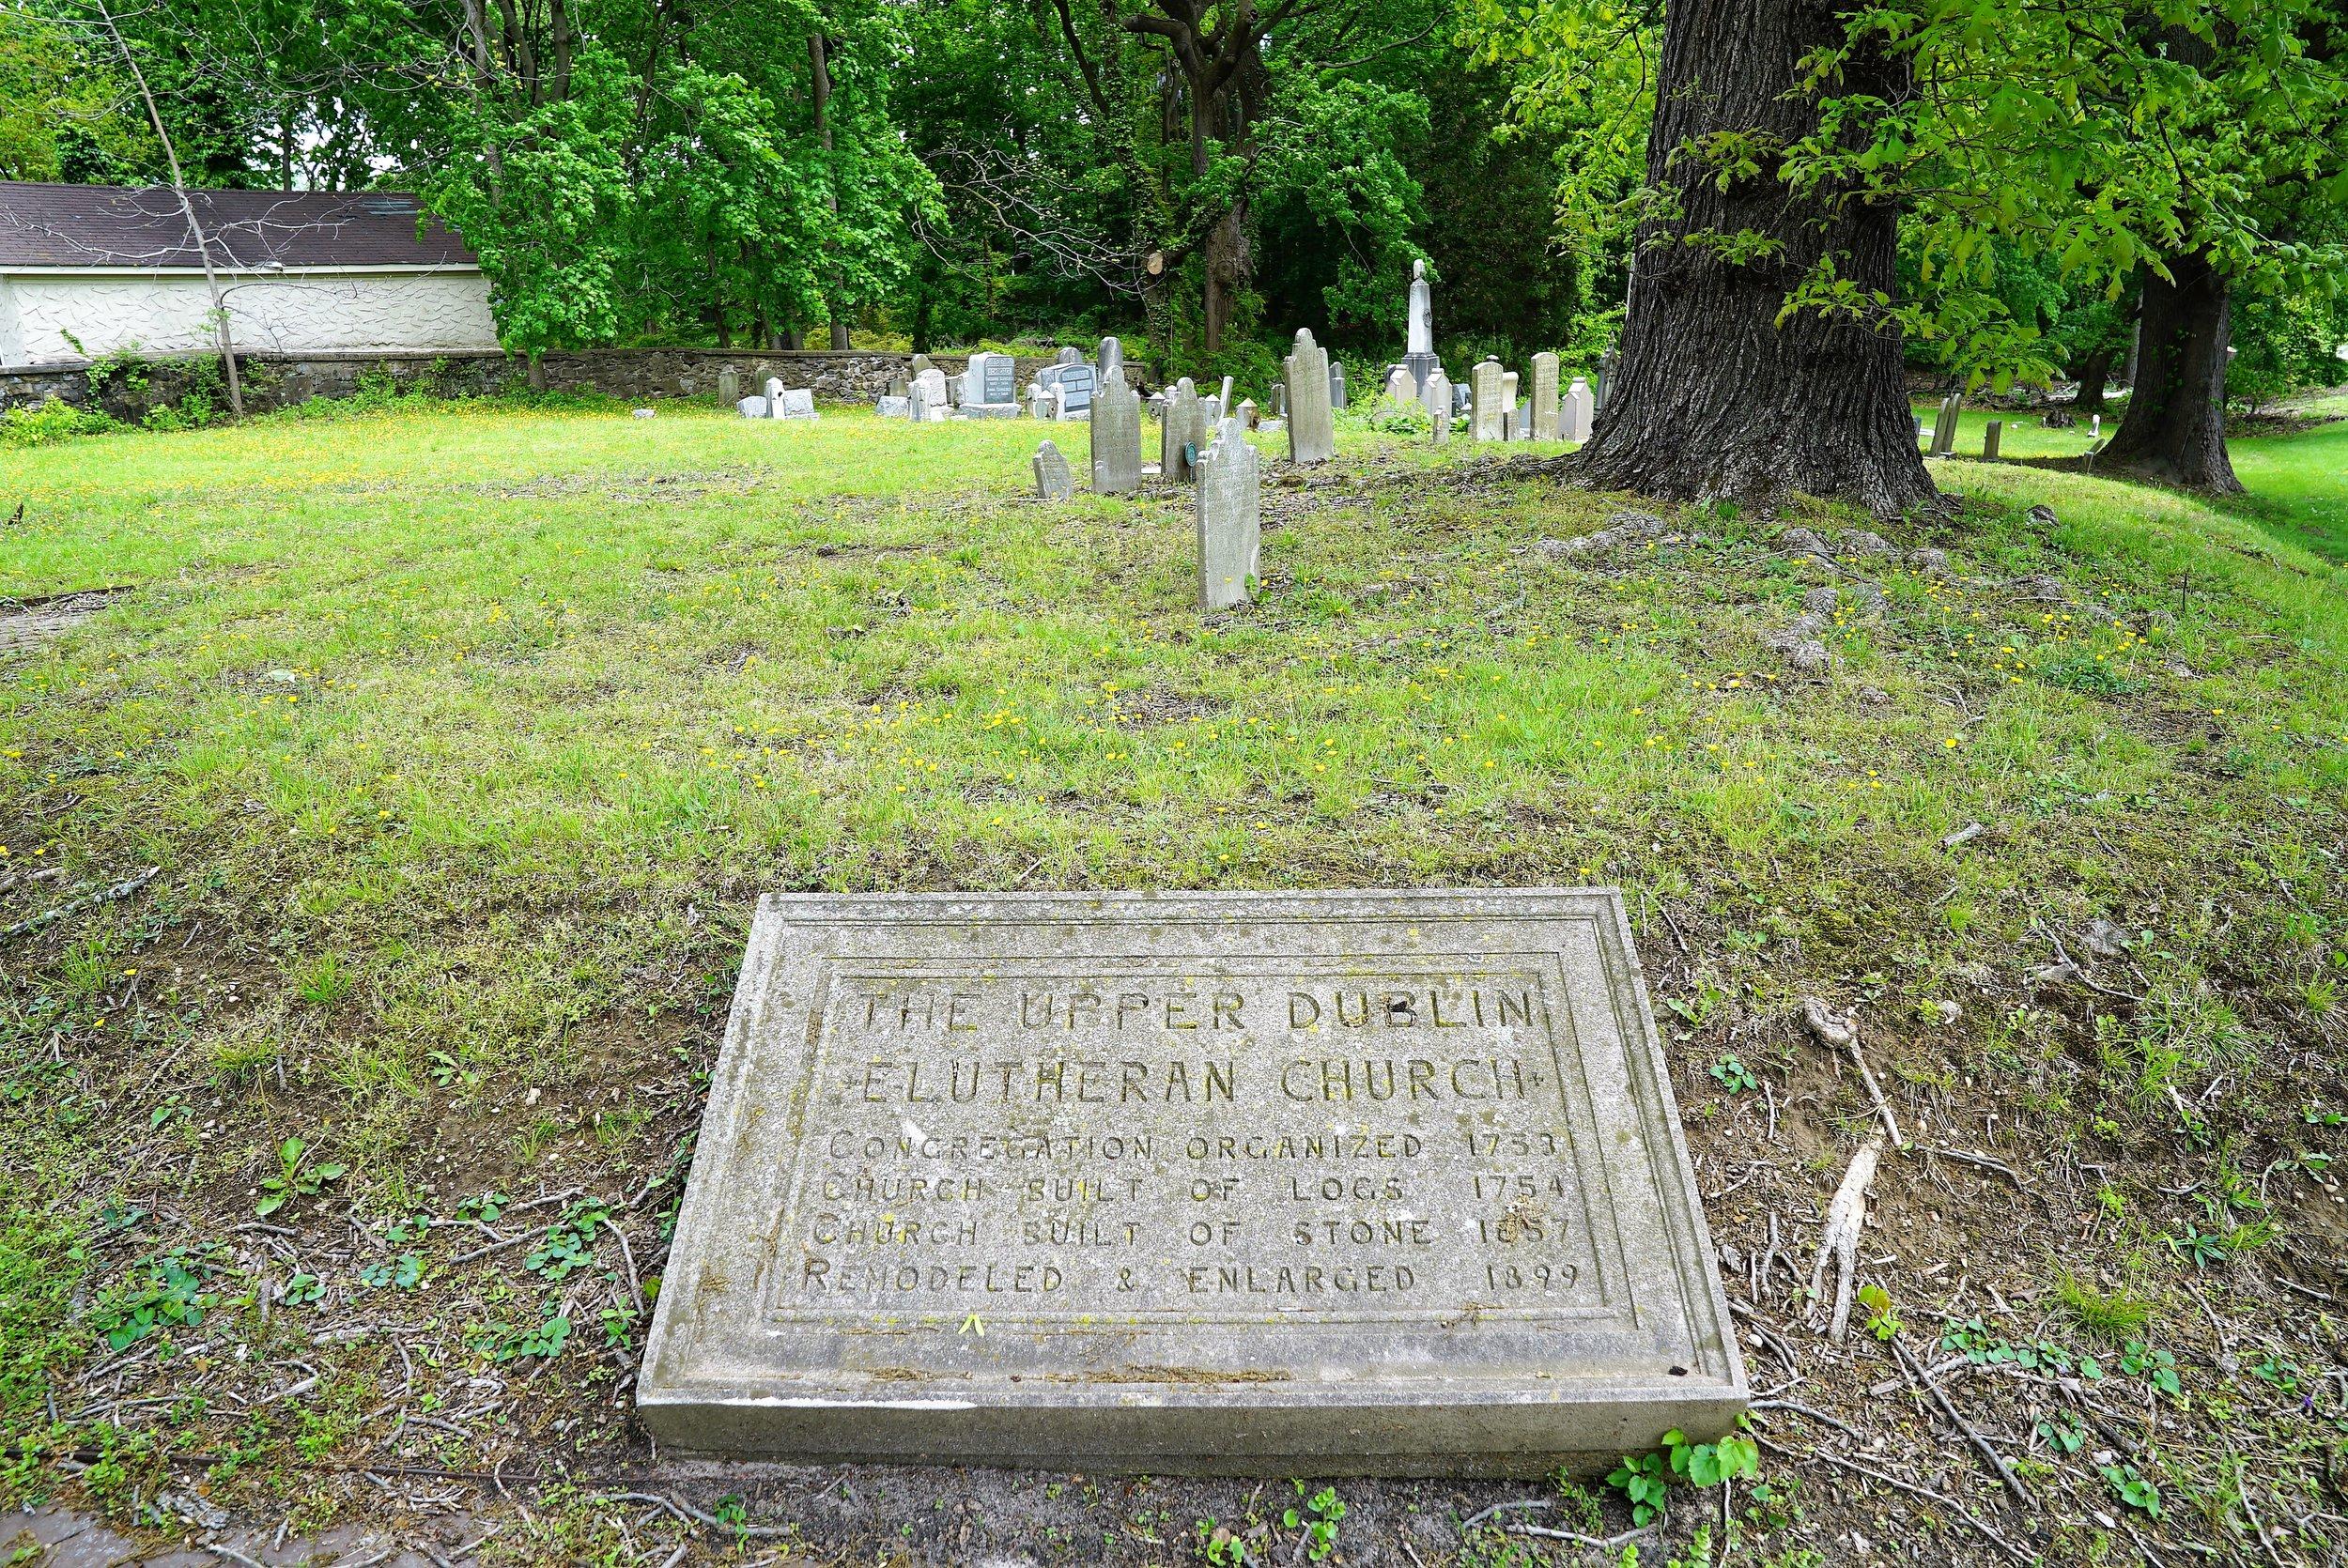 At The Upper Dublin Lutheran Church Cemetery. Ambler, Pennsylvania.